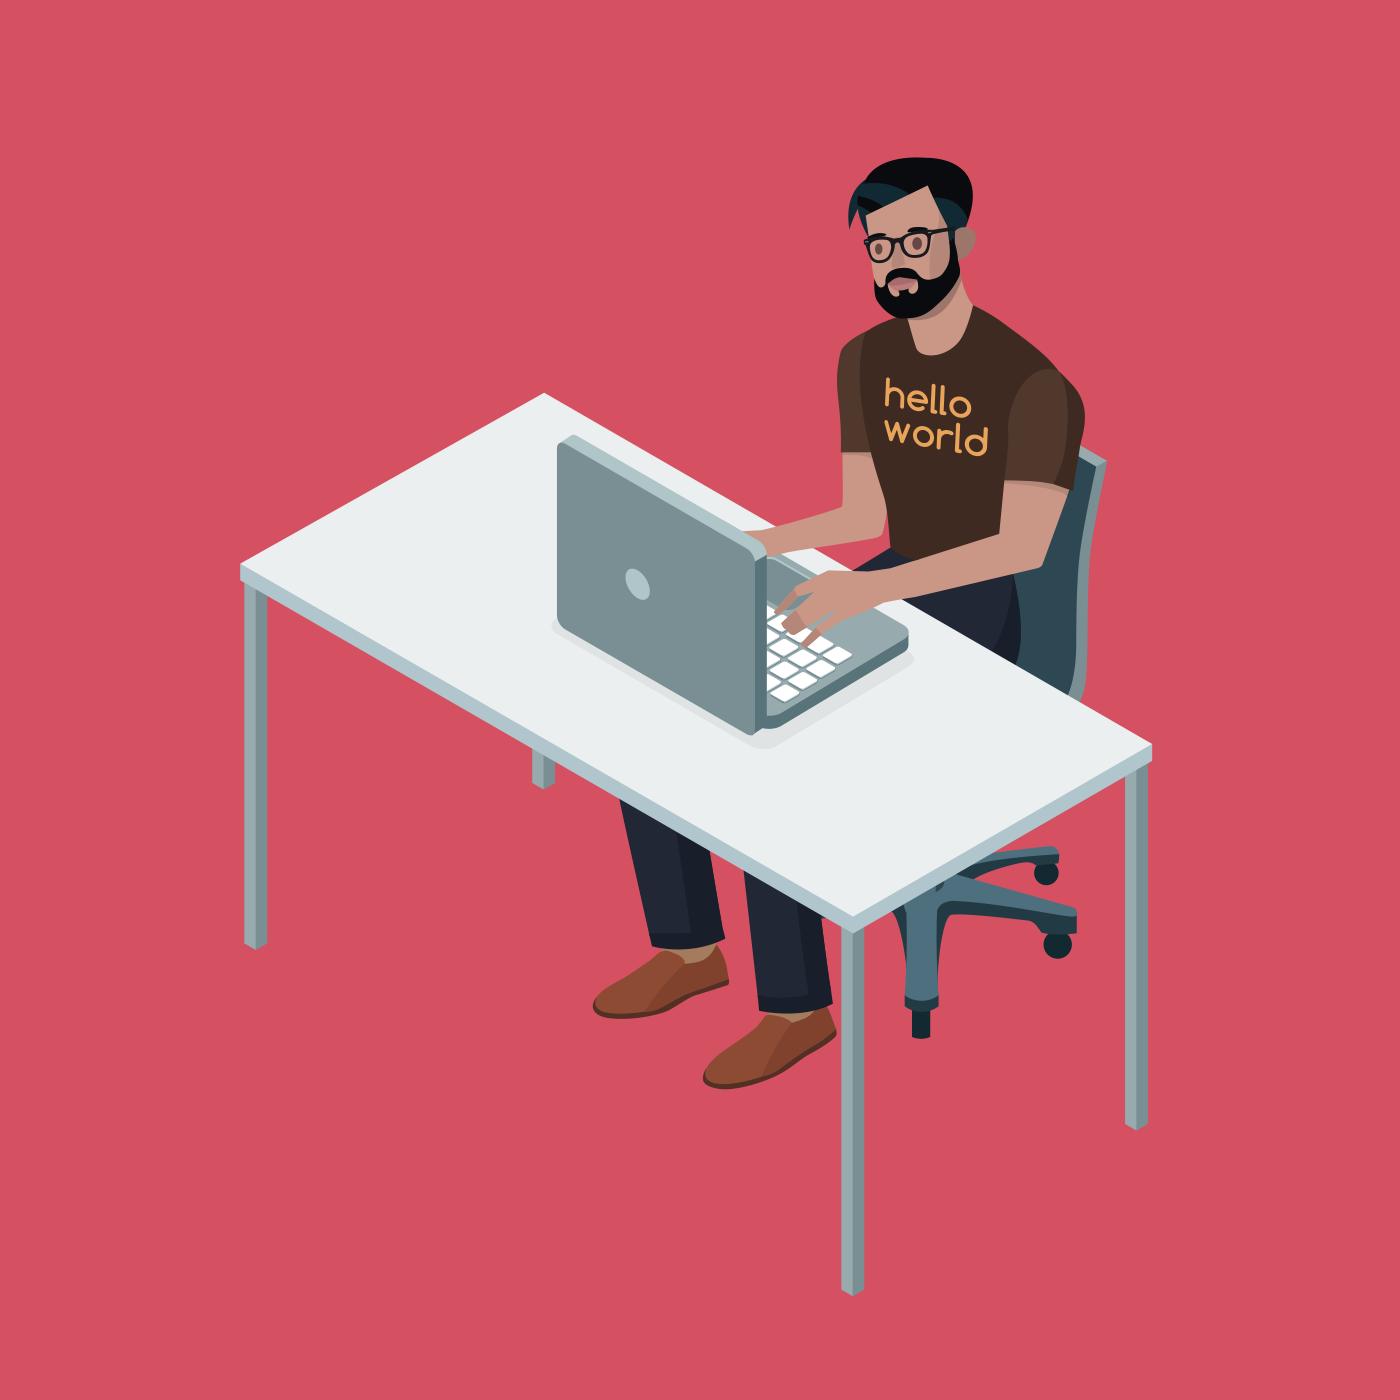 30 years programming (I'm 38) 15 years as a professional Triplebyte